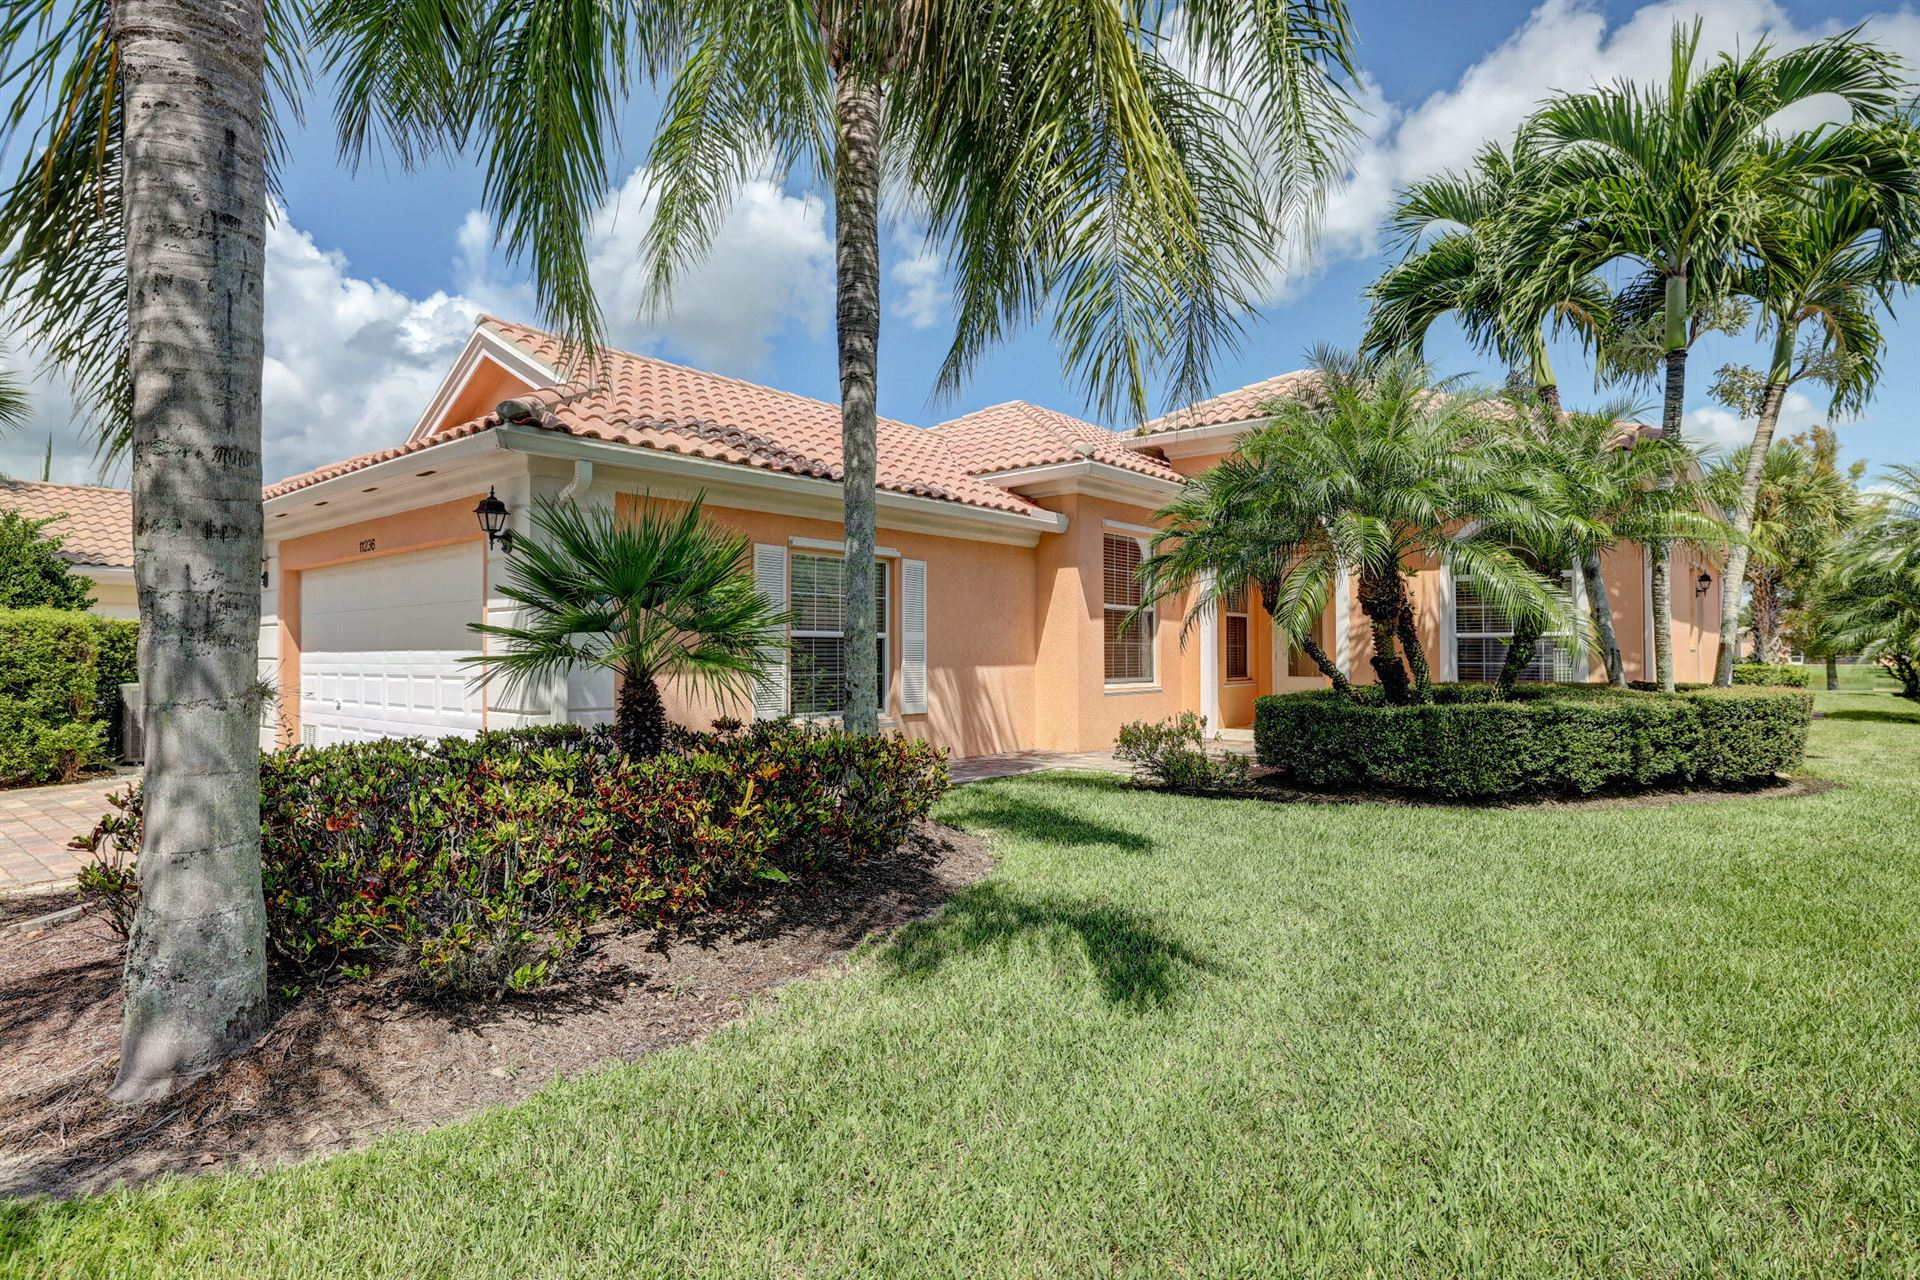 Photo of 11236 SW Northland Drive, Port Saint Lucie, FL 34987 (MLS # RX-10746320)